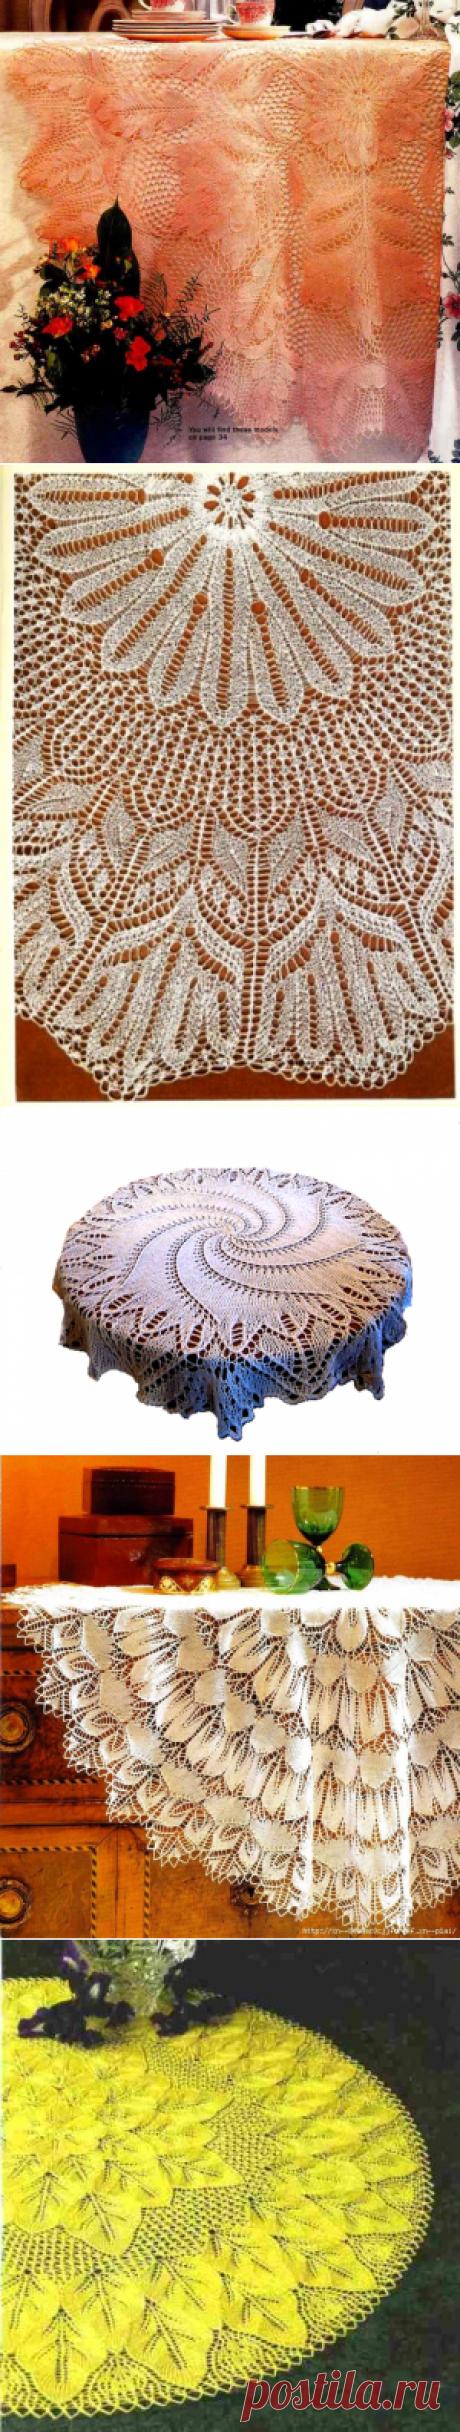 Коллекция ажурных скатертей, связанных спицами